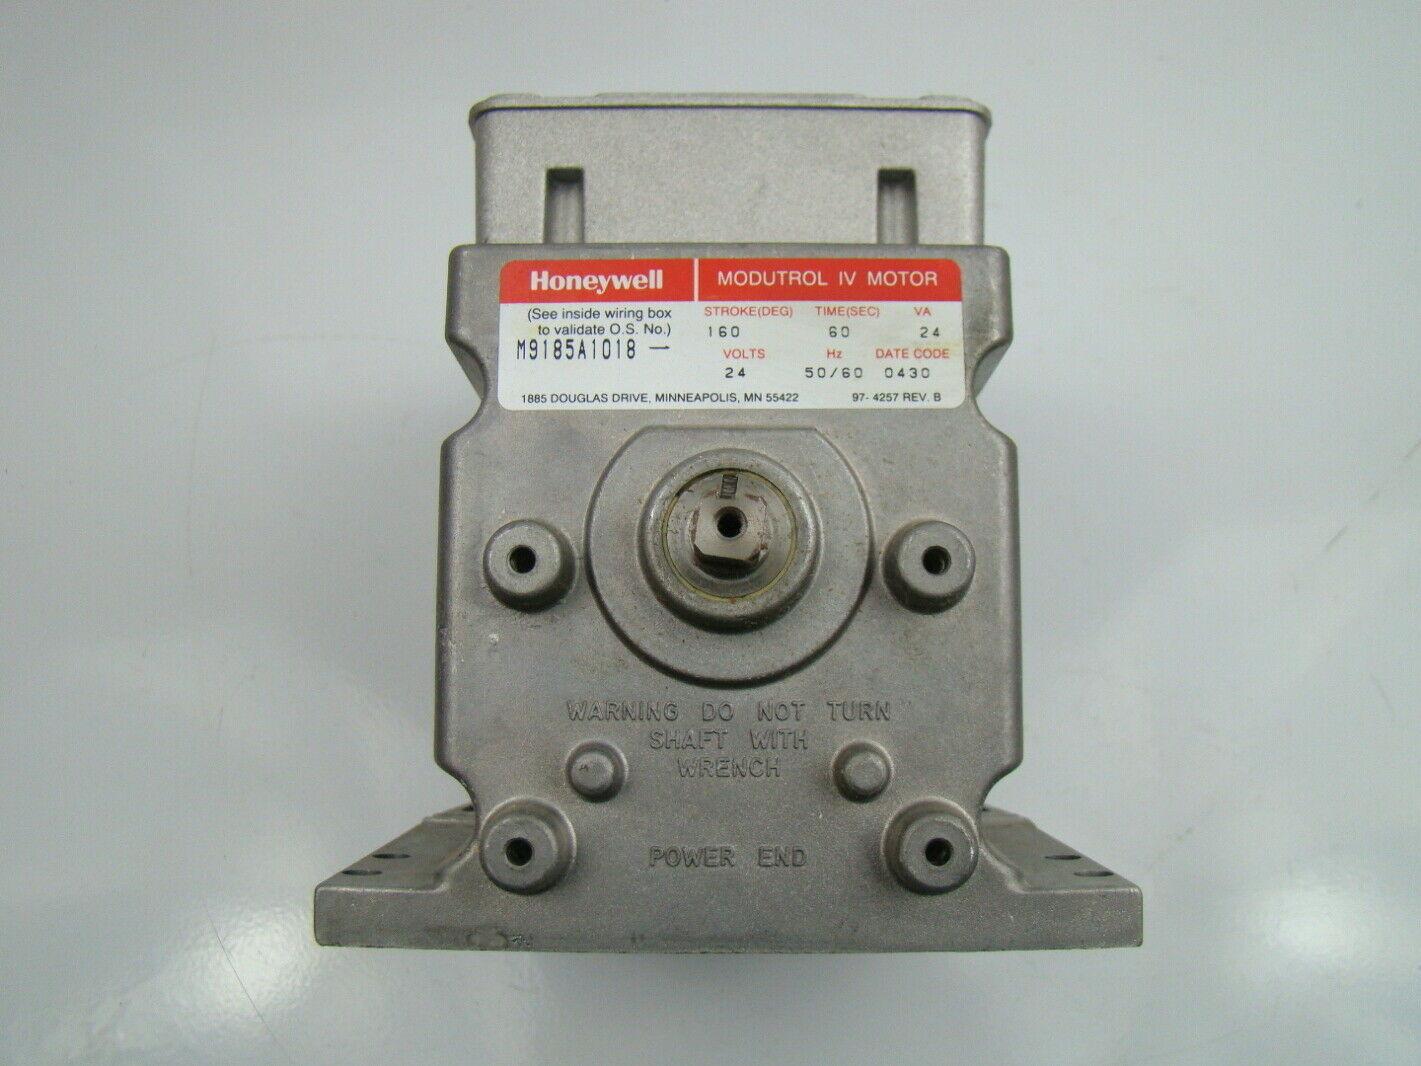 Honeywell 24 volt modutrol iv motor m9185a1018 ebay 24 volt motors